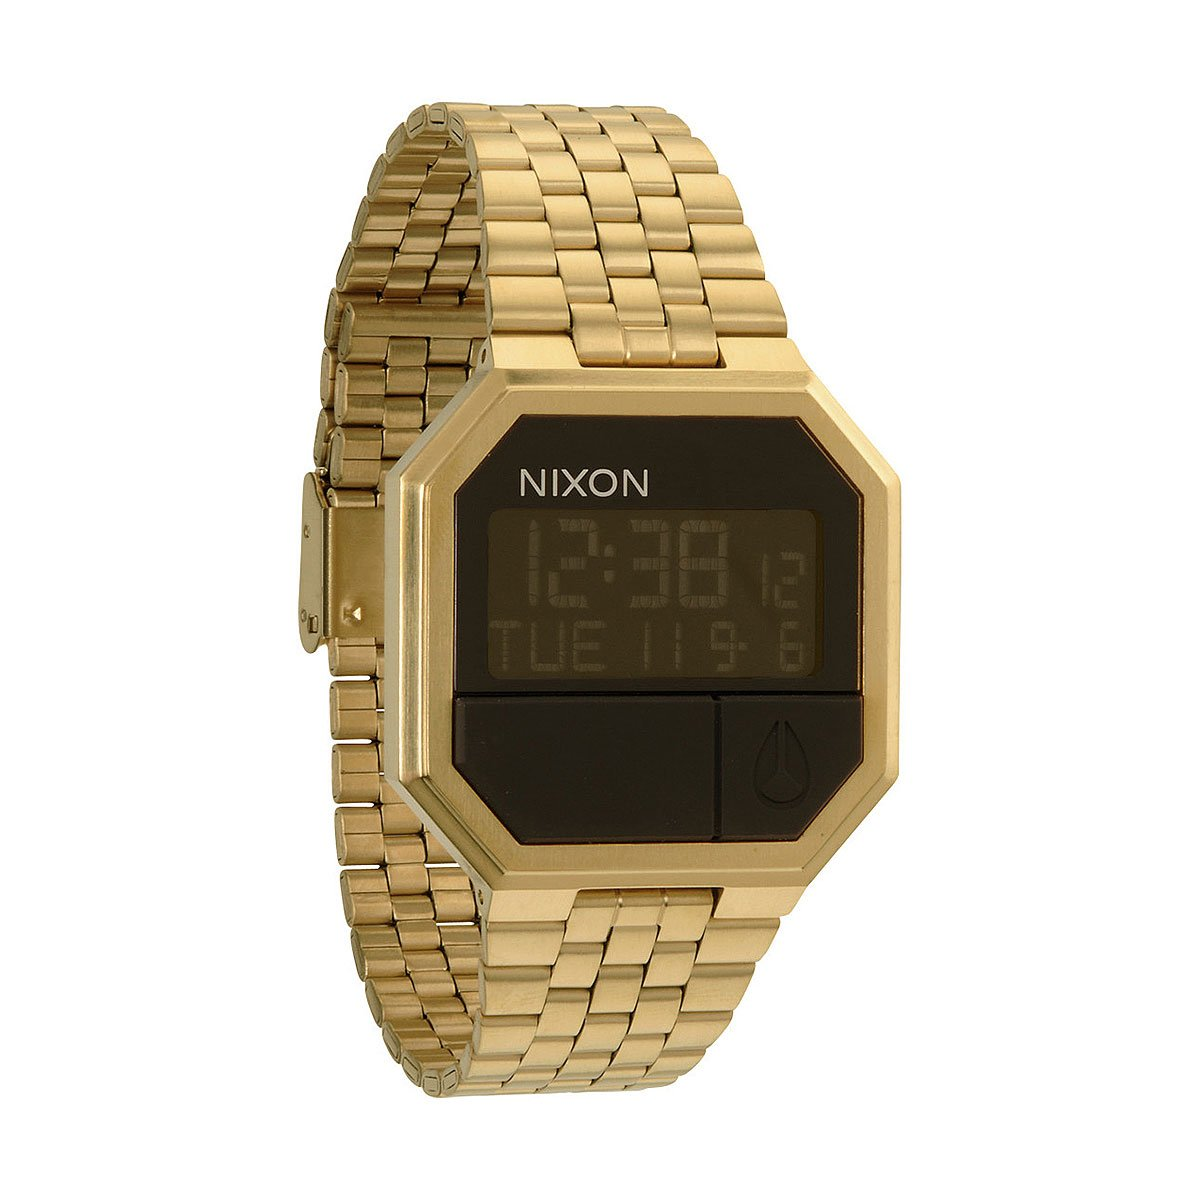 c89d86b4 Купить часы Nixon Re-run All Gold в интернет-магазине Proskater.by